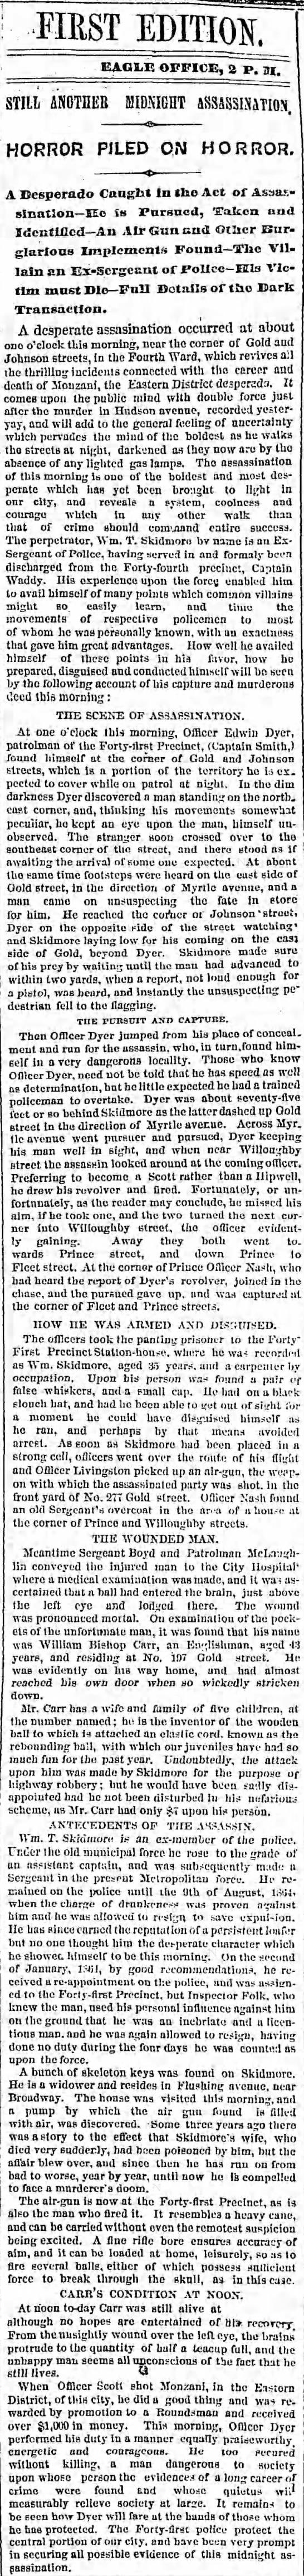 Patrolman Edwin Brough Dyer captures assassin in the 4th Ward.